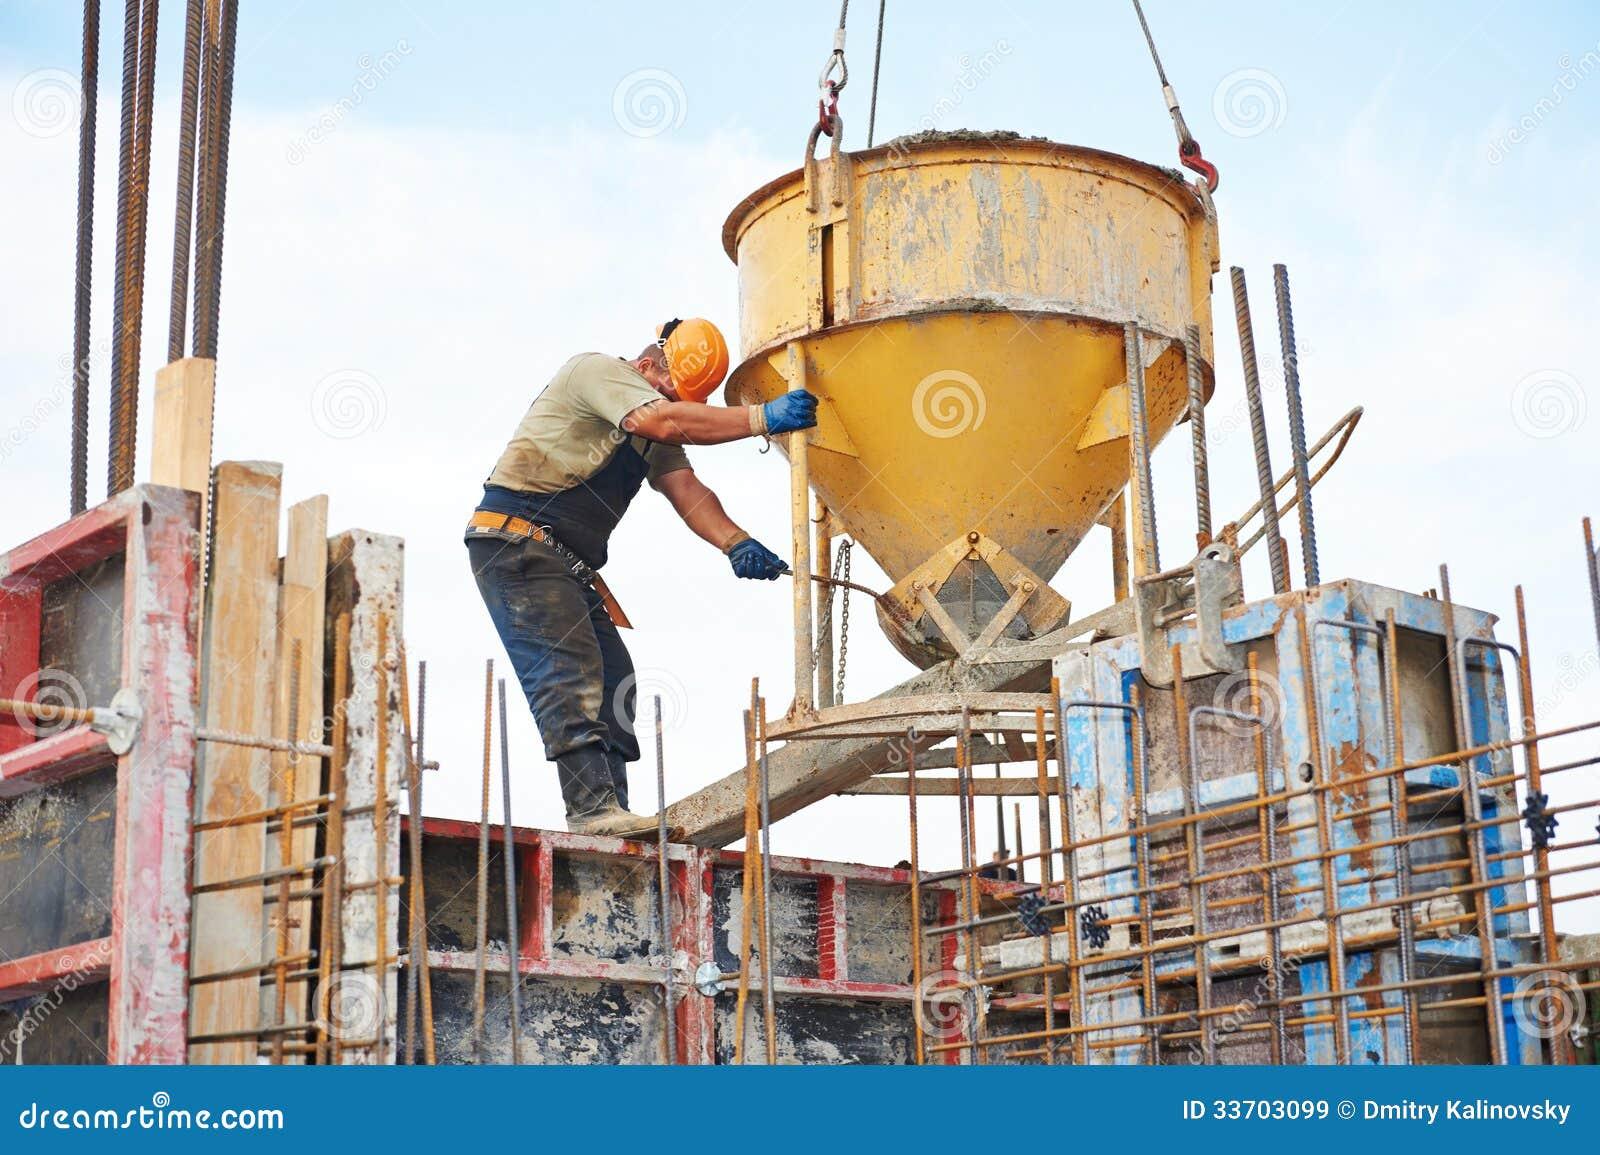 Concrete Building Construction : Building workers pouring concrete with barrel stock image